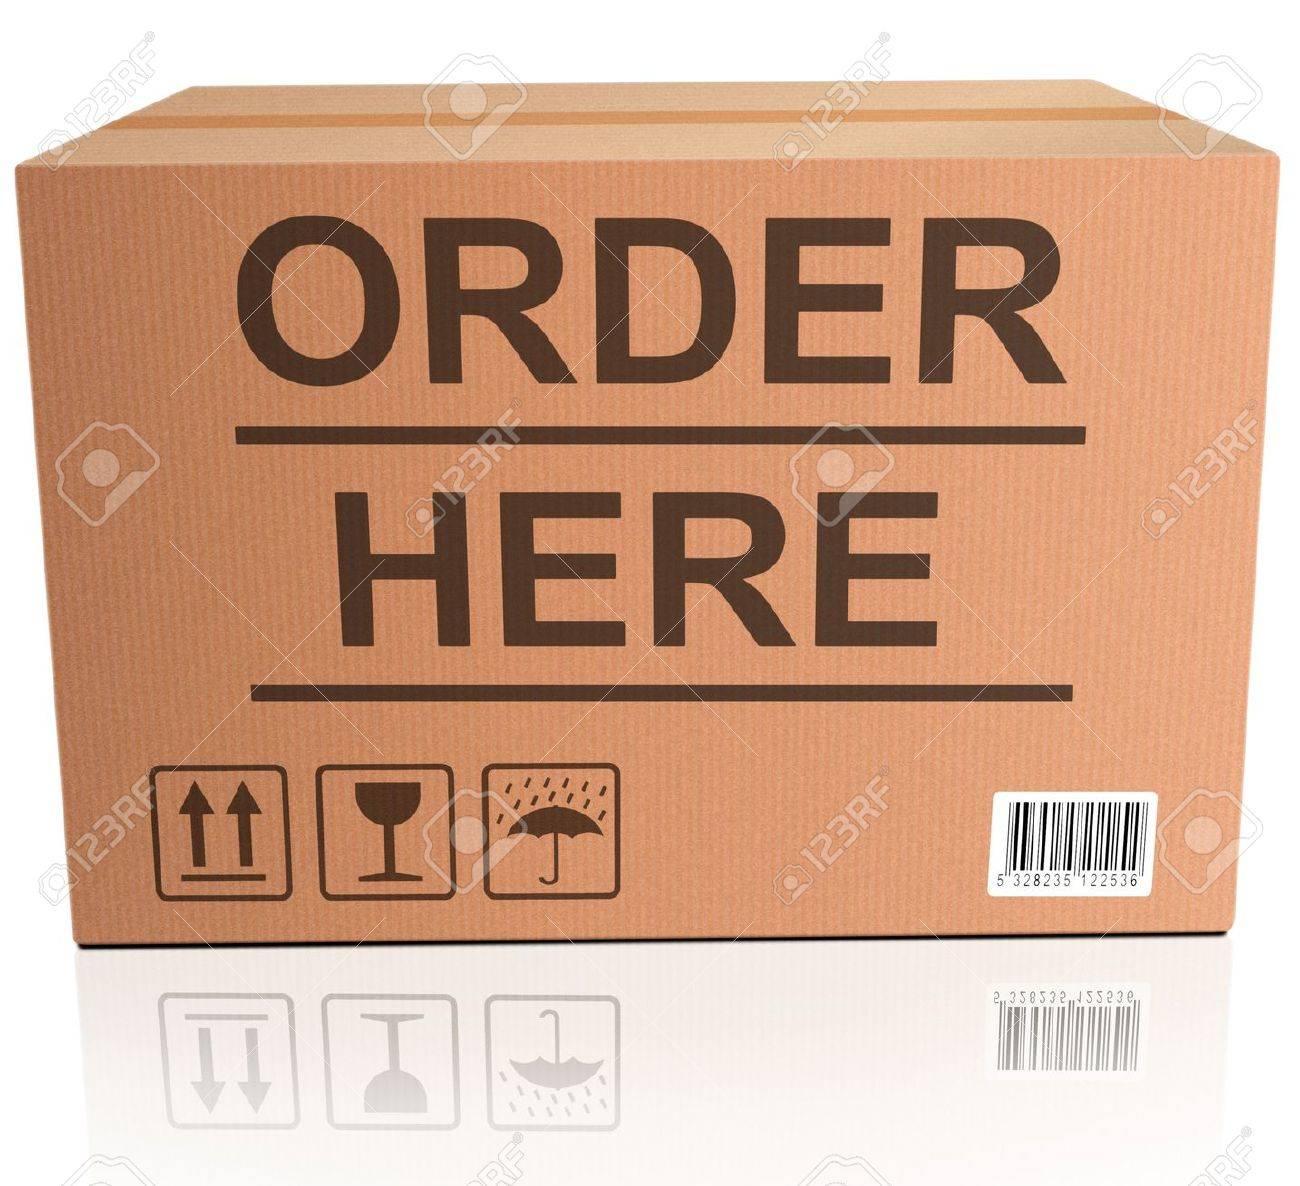 order here webshop icon cardboard box with text online internet web shop illustration Stock Illustration - 15889230